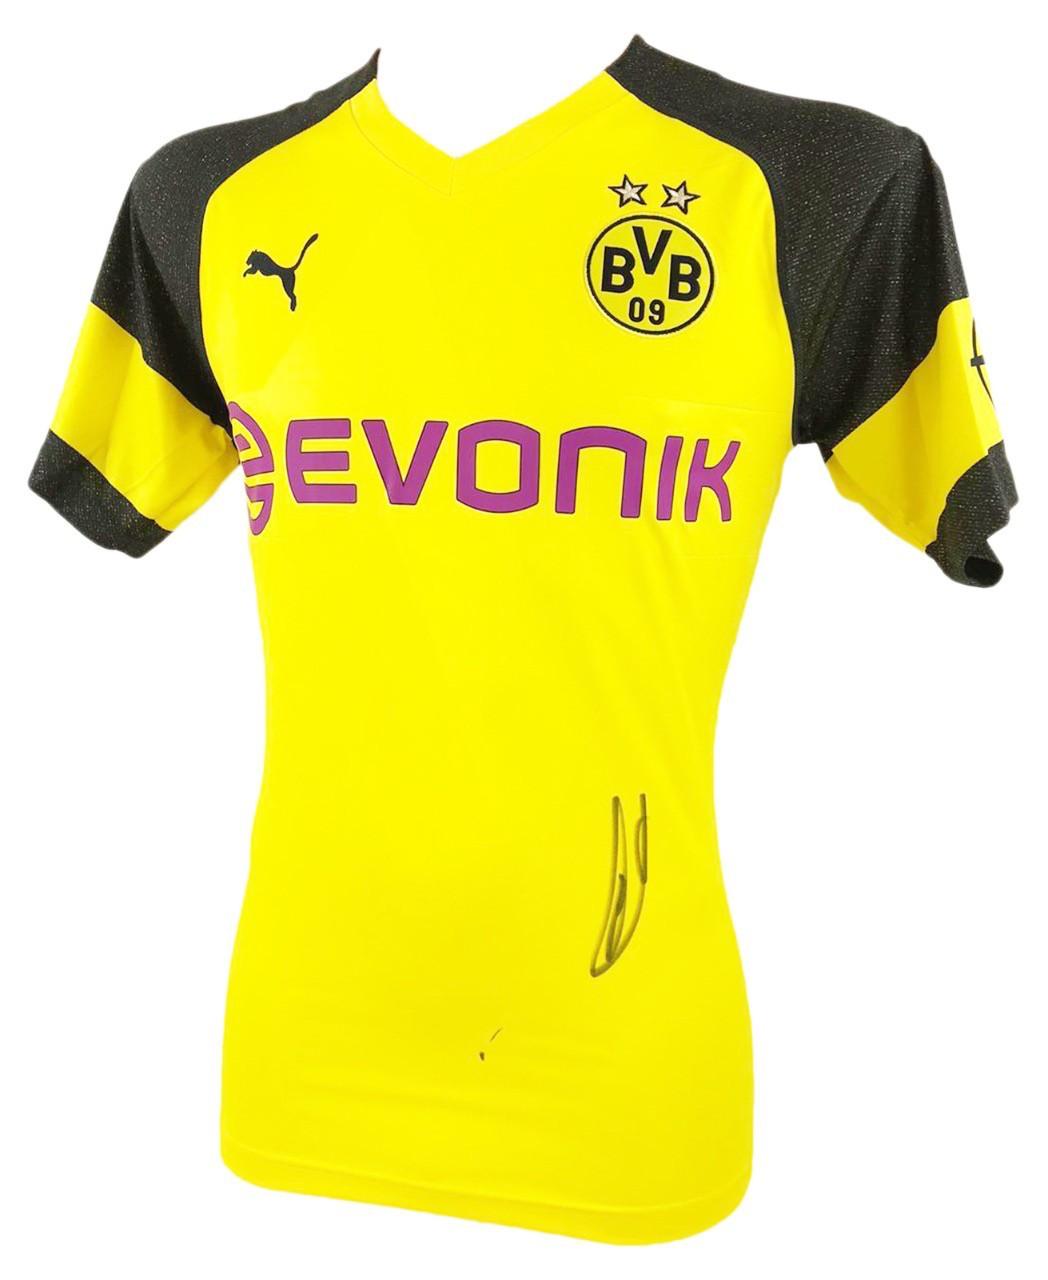 Marco Reus Autograph Signed Borussia Dortmund Jersey Shirt Firma Stella